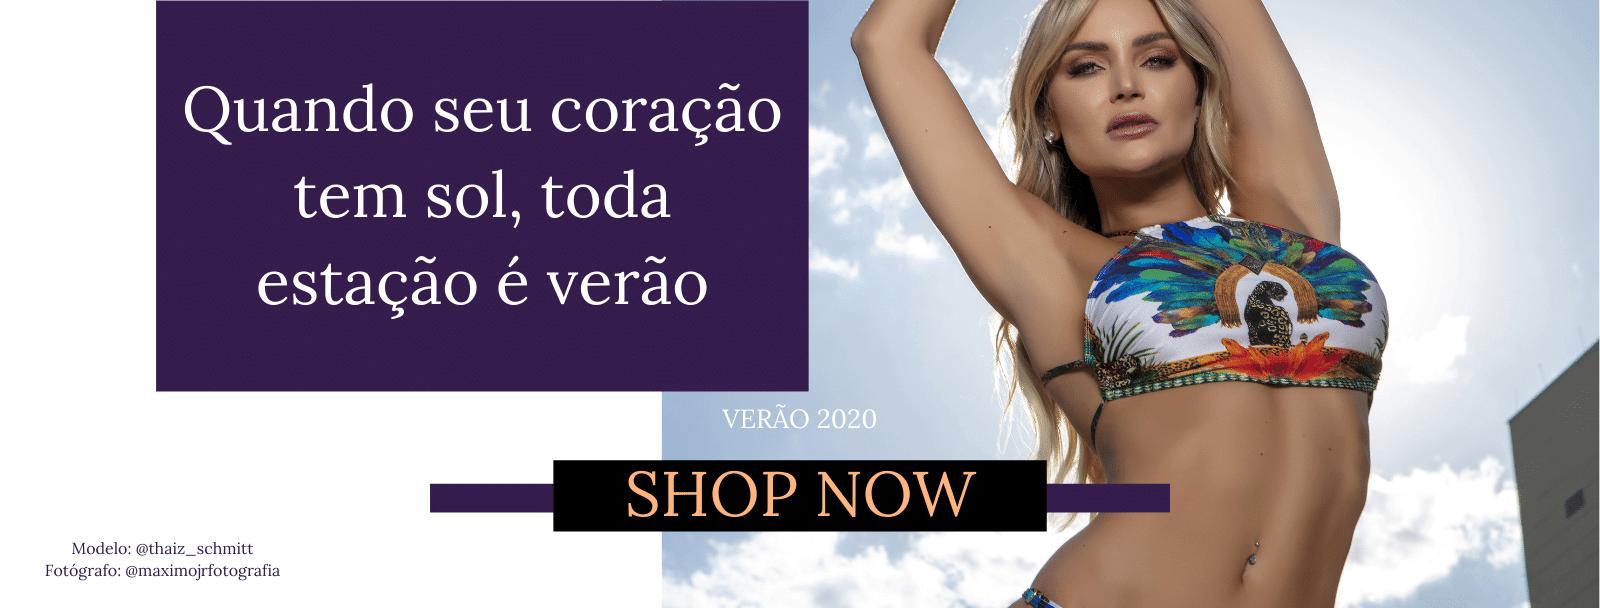 loja-online-moda-praia-livelle-beachwear-3